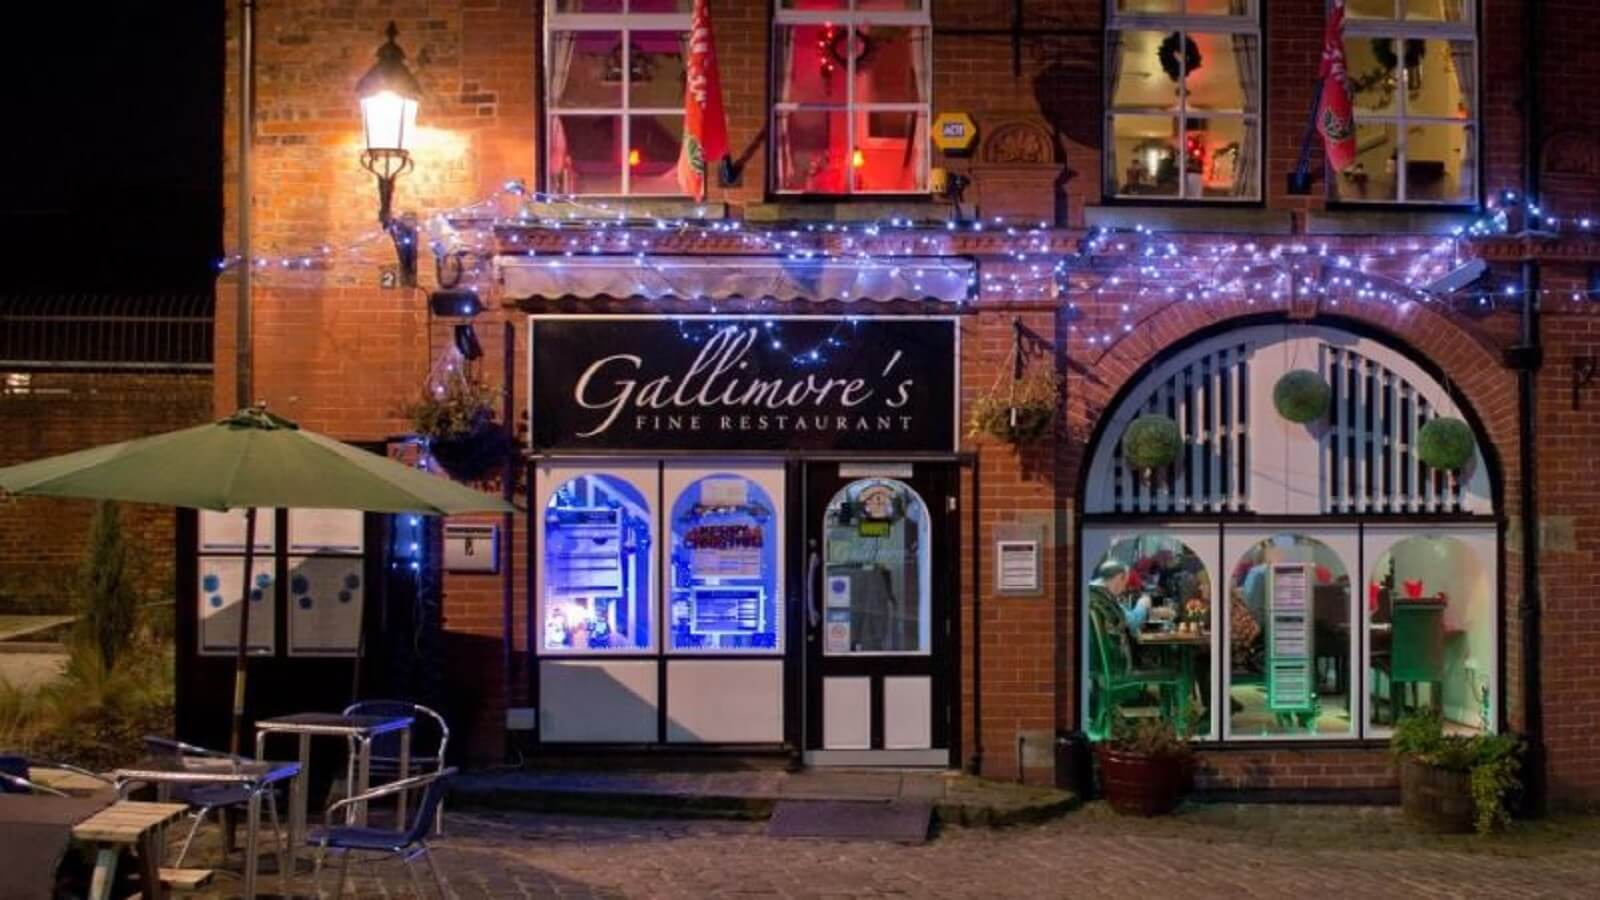 Gallimore's Fine Restaurant